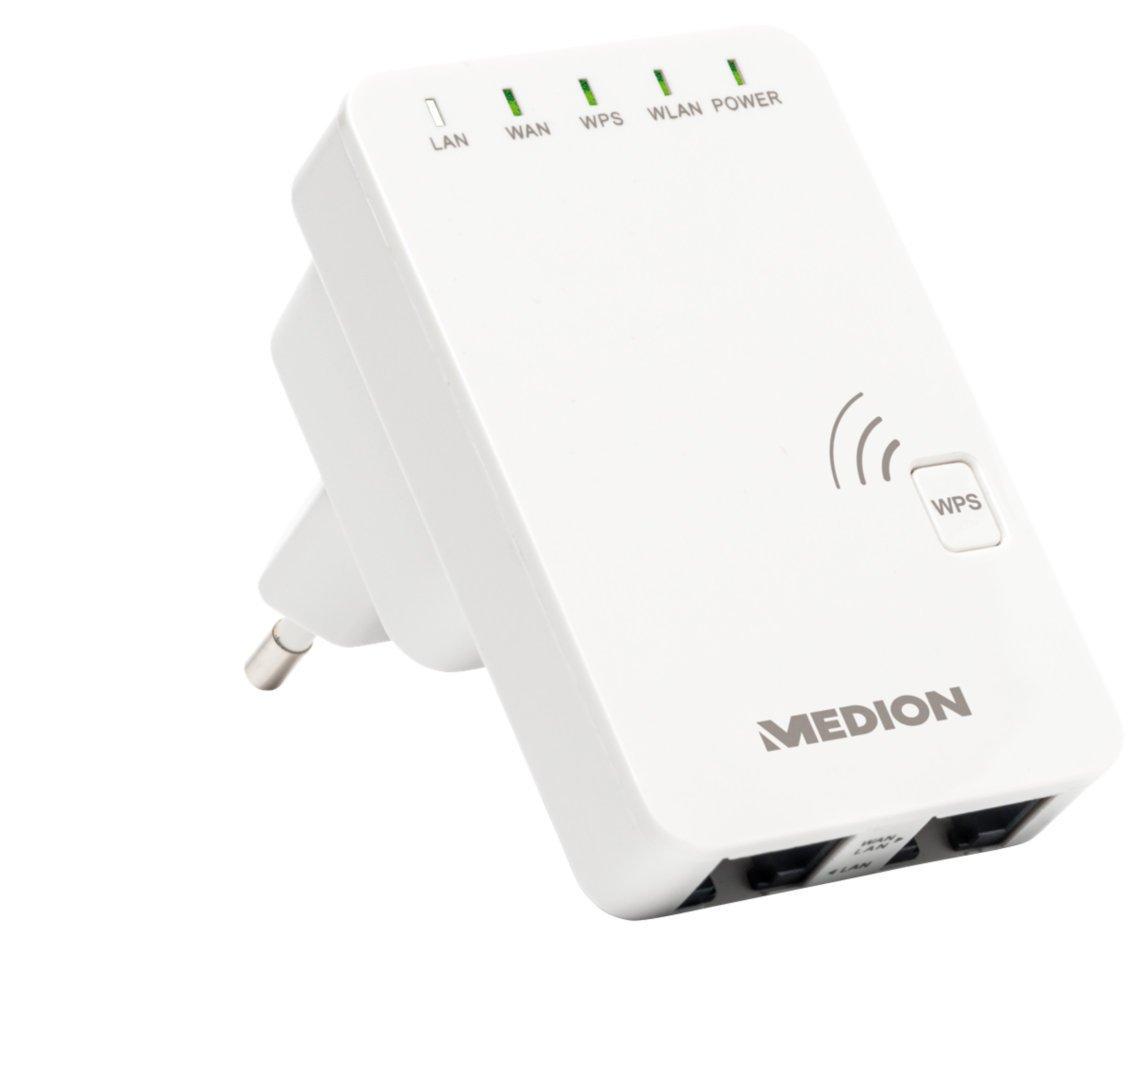 medion p85023 wifi range extender supports wps amazon co uk Wireless LAN Design medion p85023 wifi range extender supports wps amazon co uk electronics